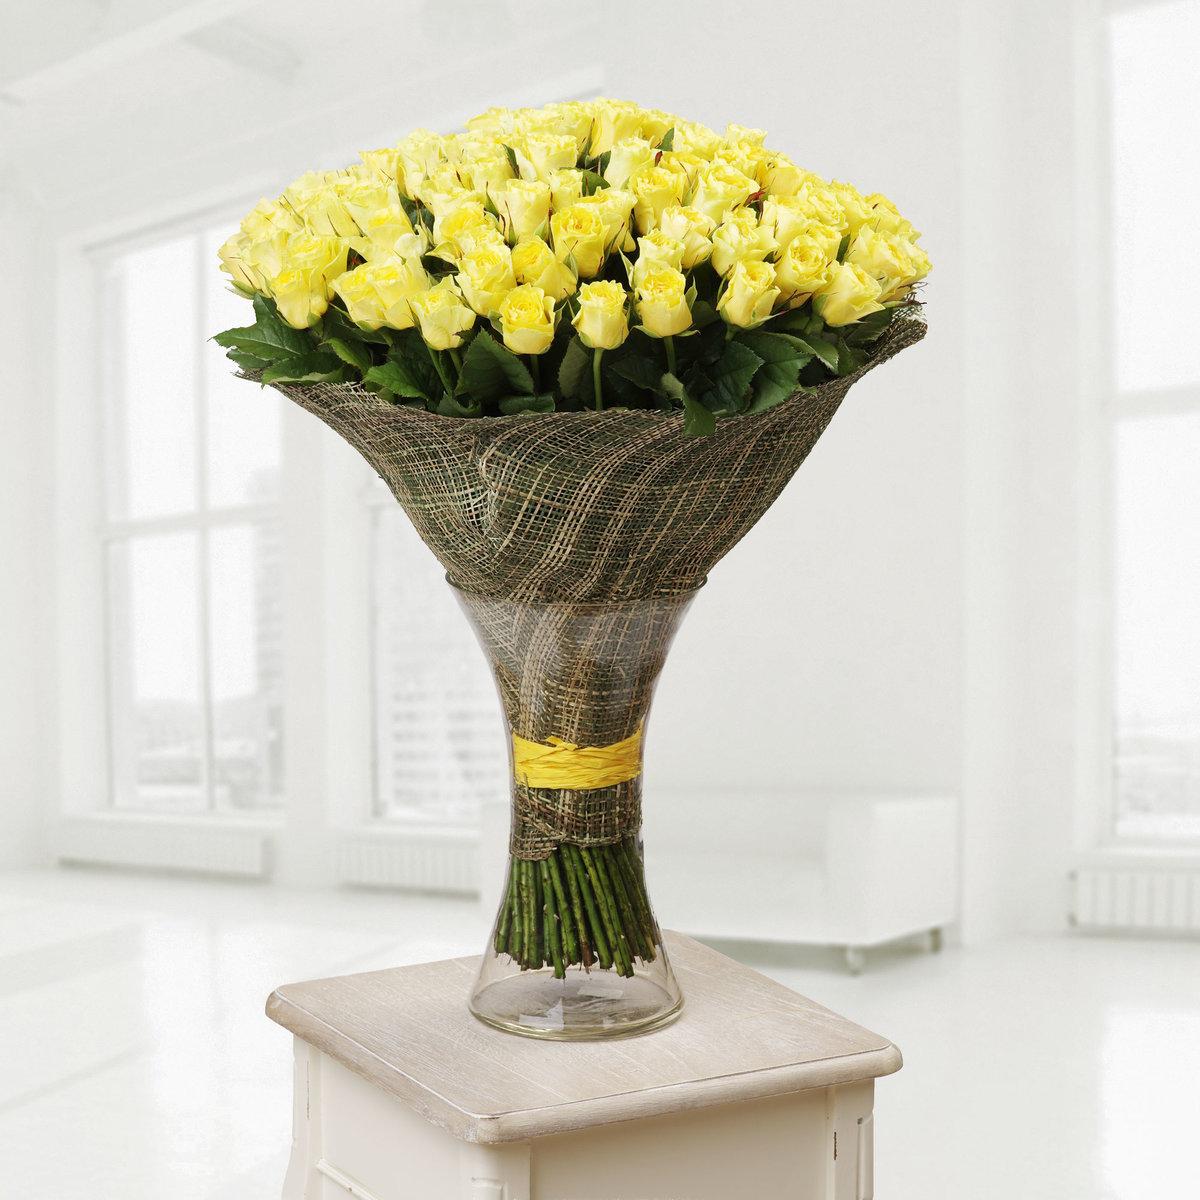 Цветы оптом 101 розу барнаул, букеты